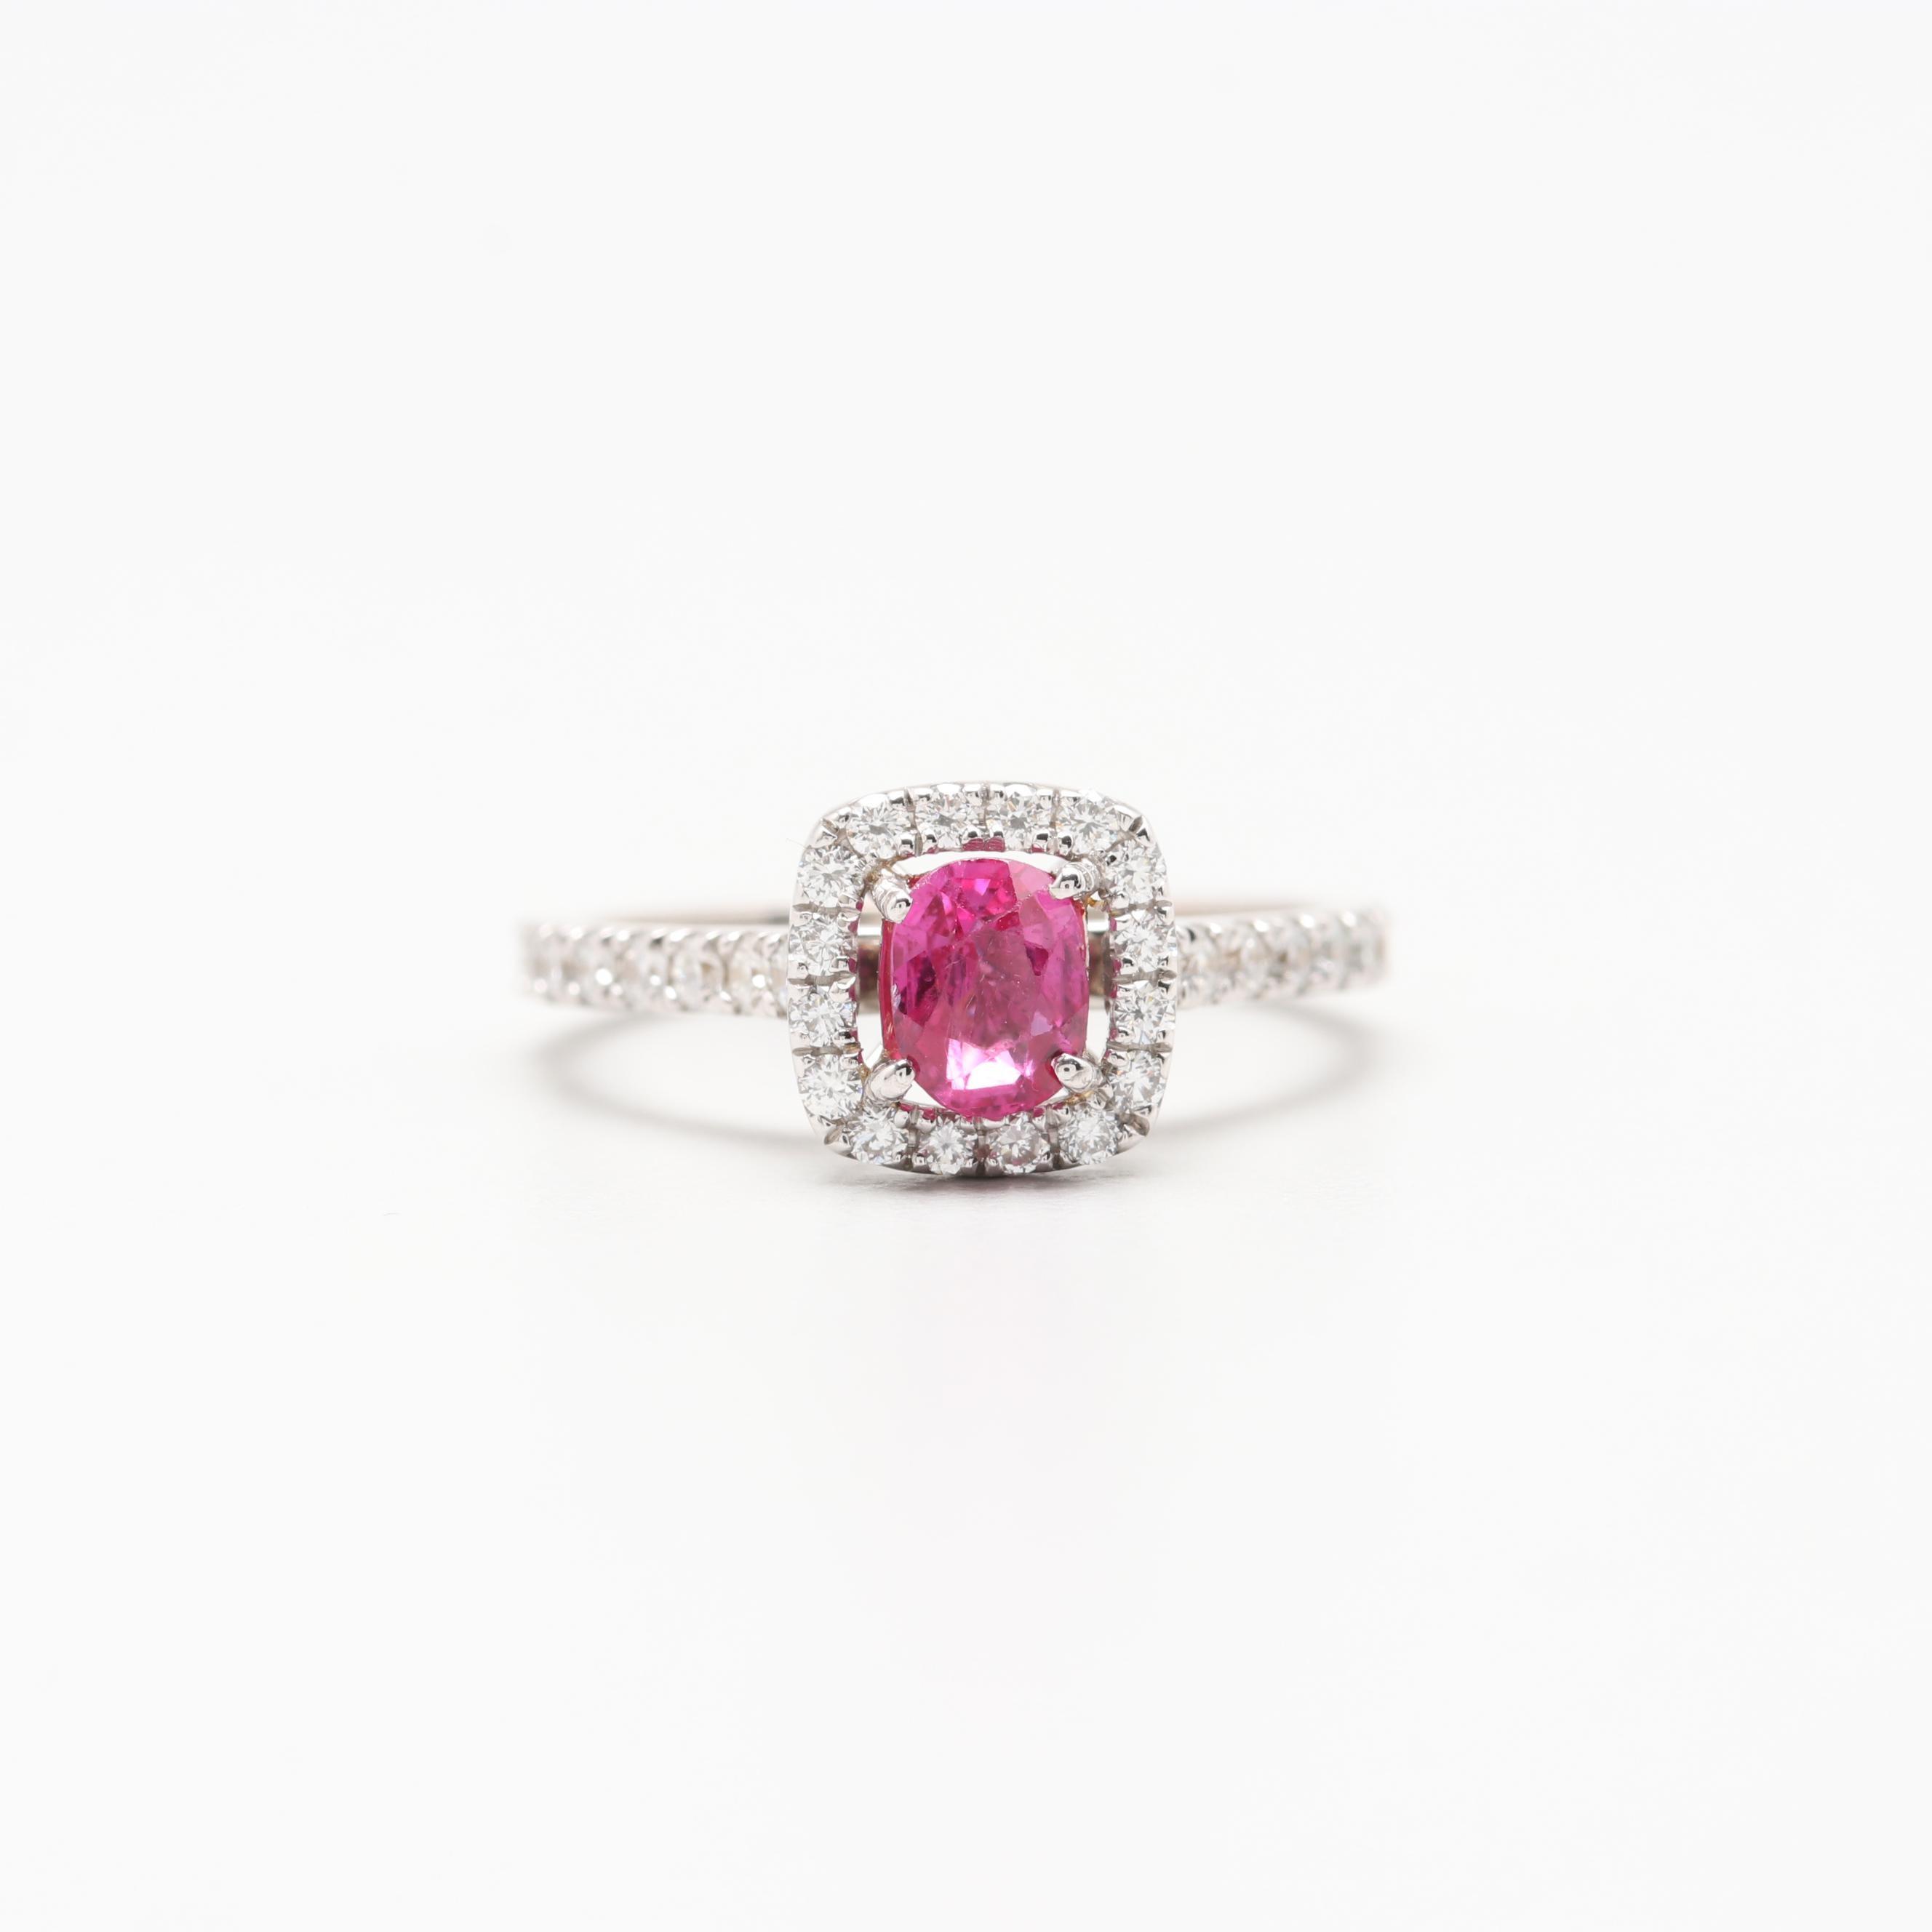 Leibish & Co. 18K White Gold Unheated Pink Sapphire and Diamond Ring